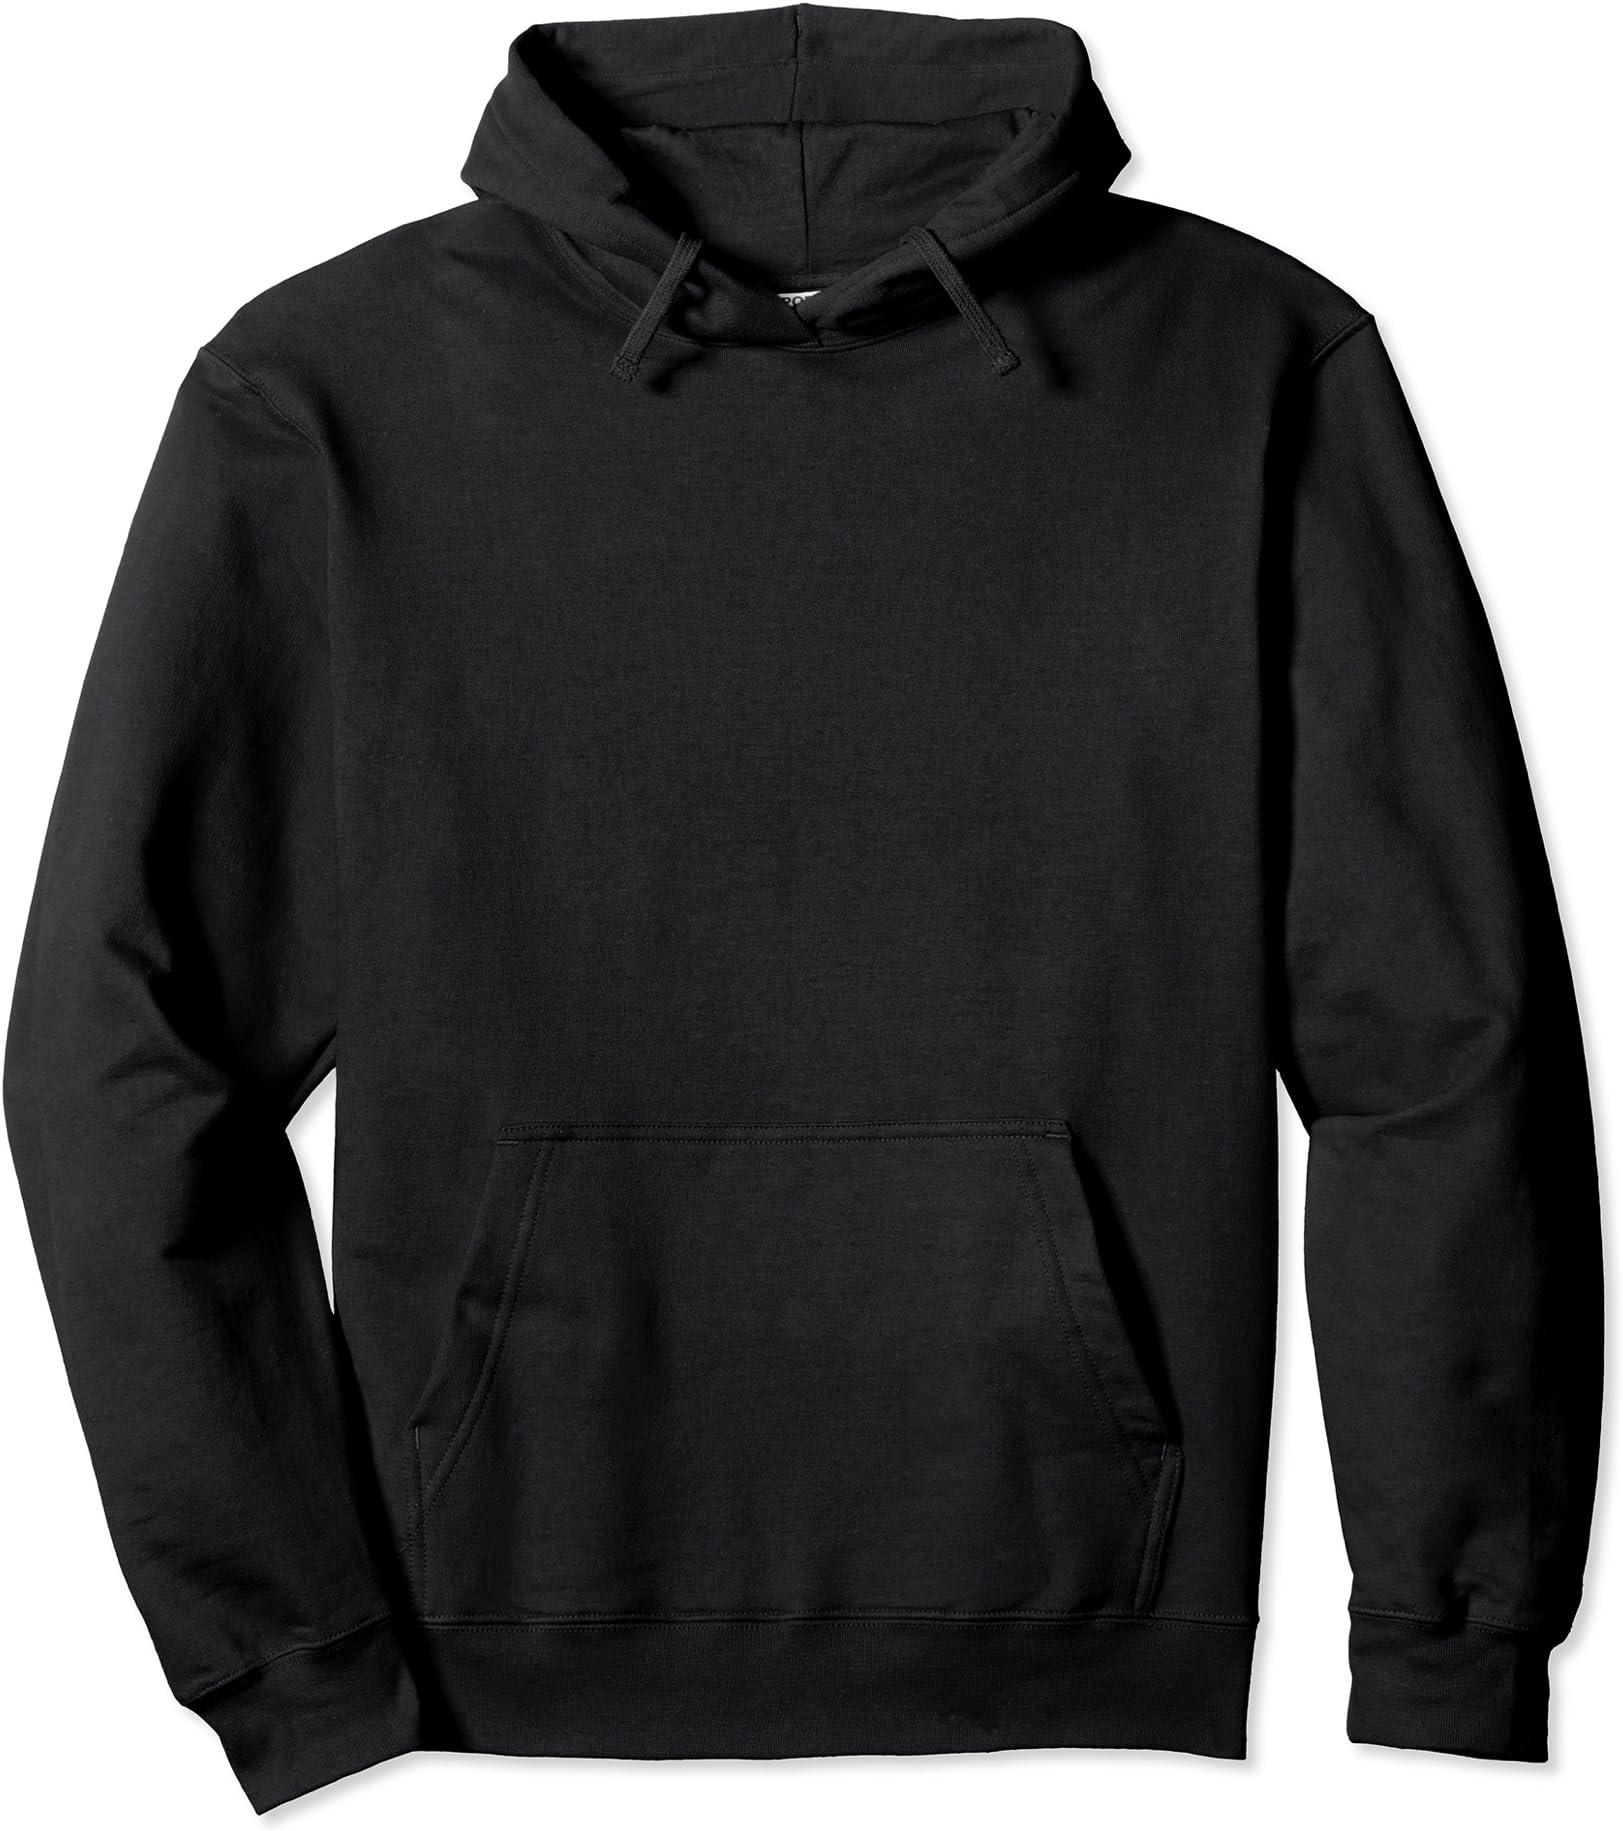 The Kind Coalition Signature Logo Hooded Sweatshirt